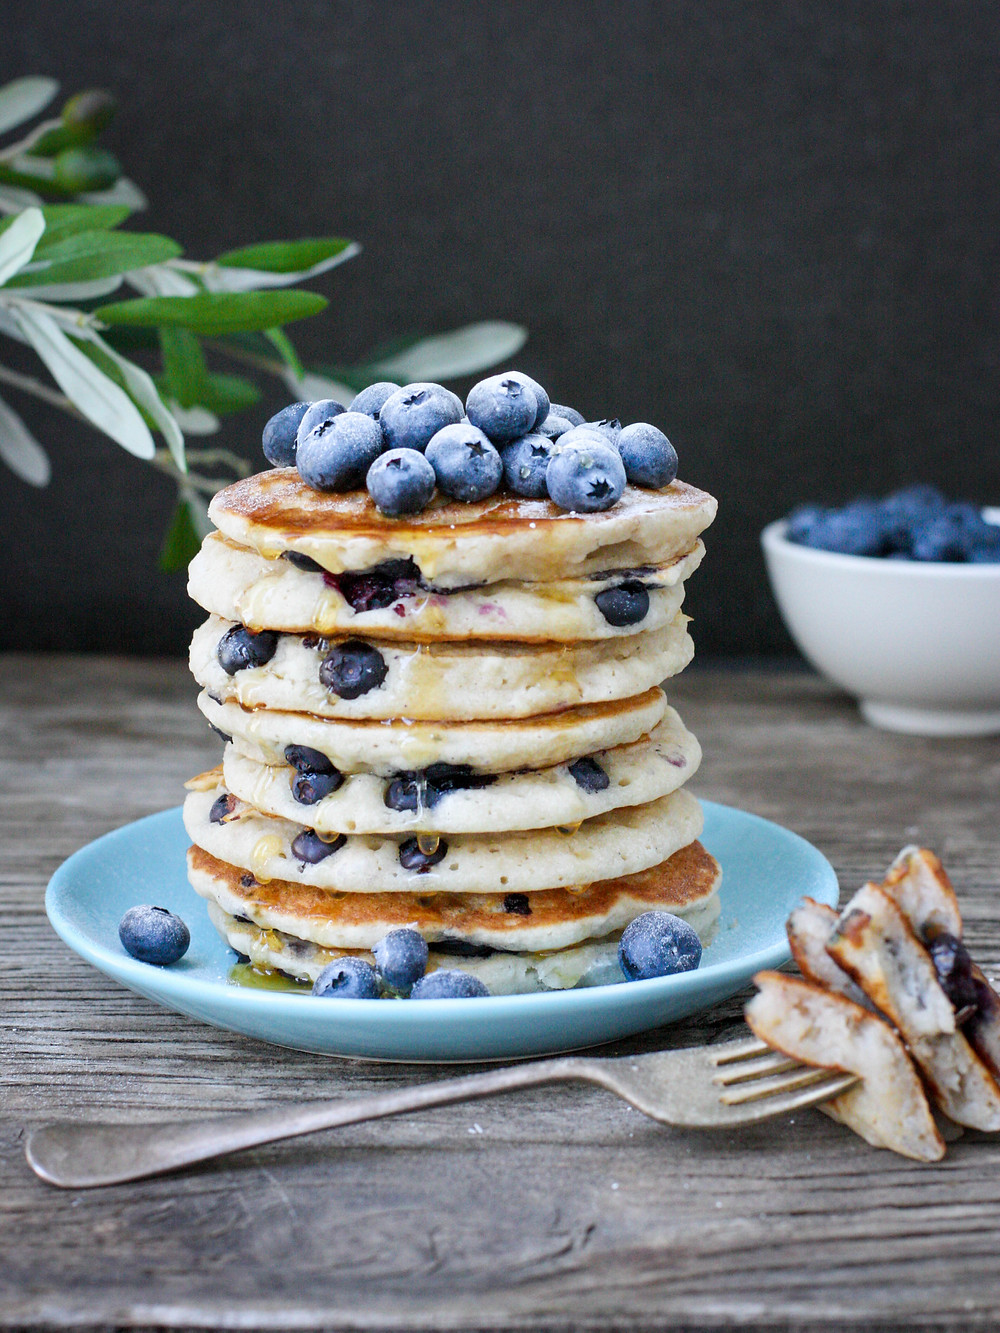 Vegan Blueberry Gluten Free Pancakes